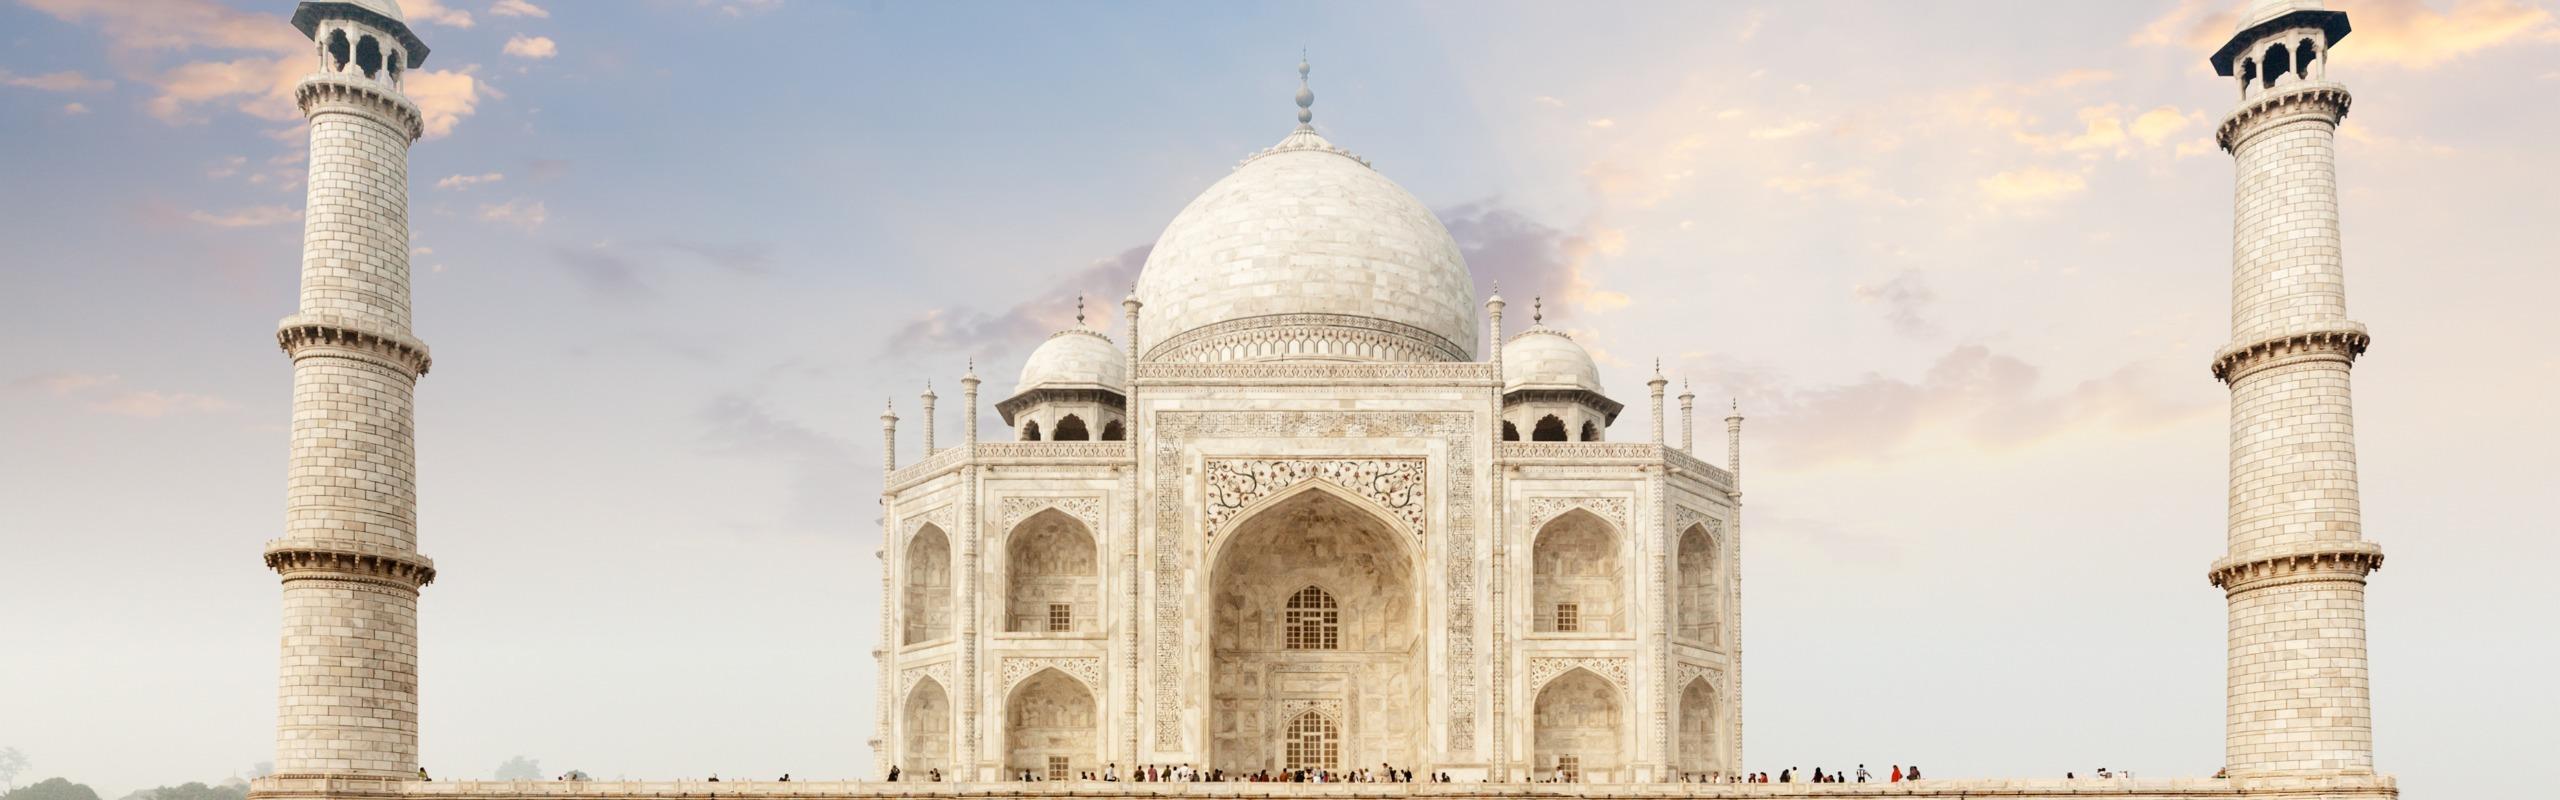 What's Inside the Taj Mahal?